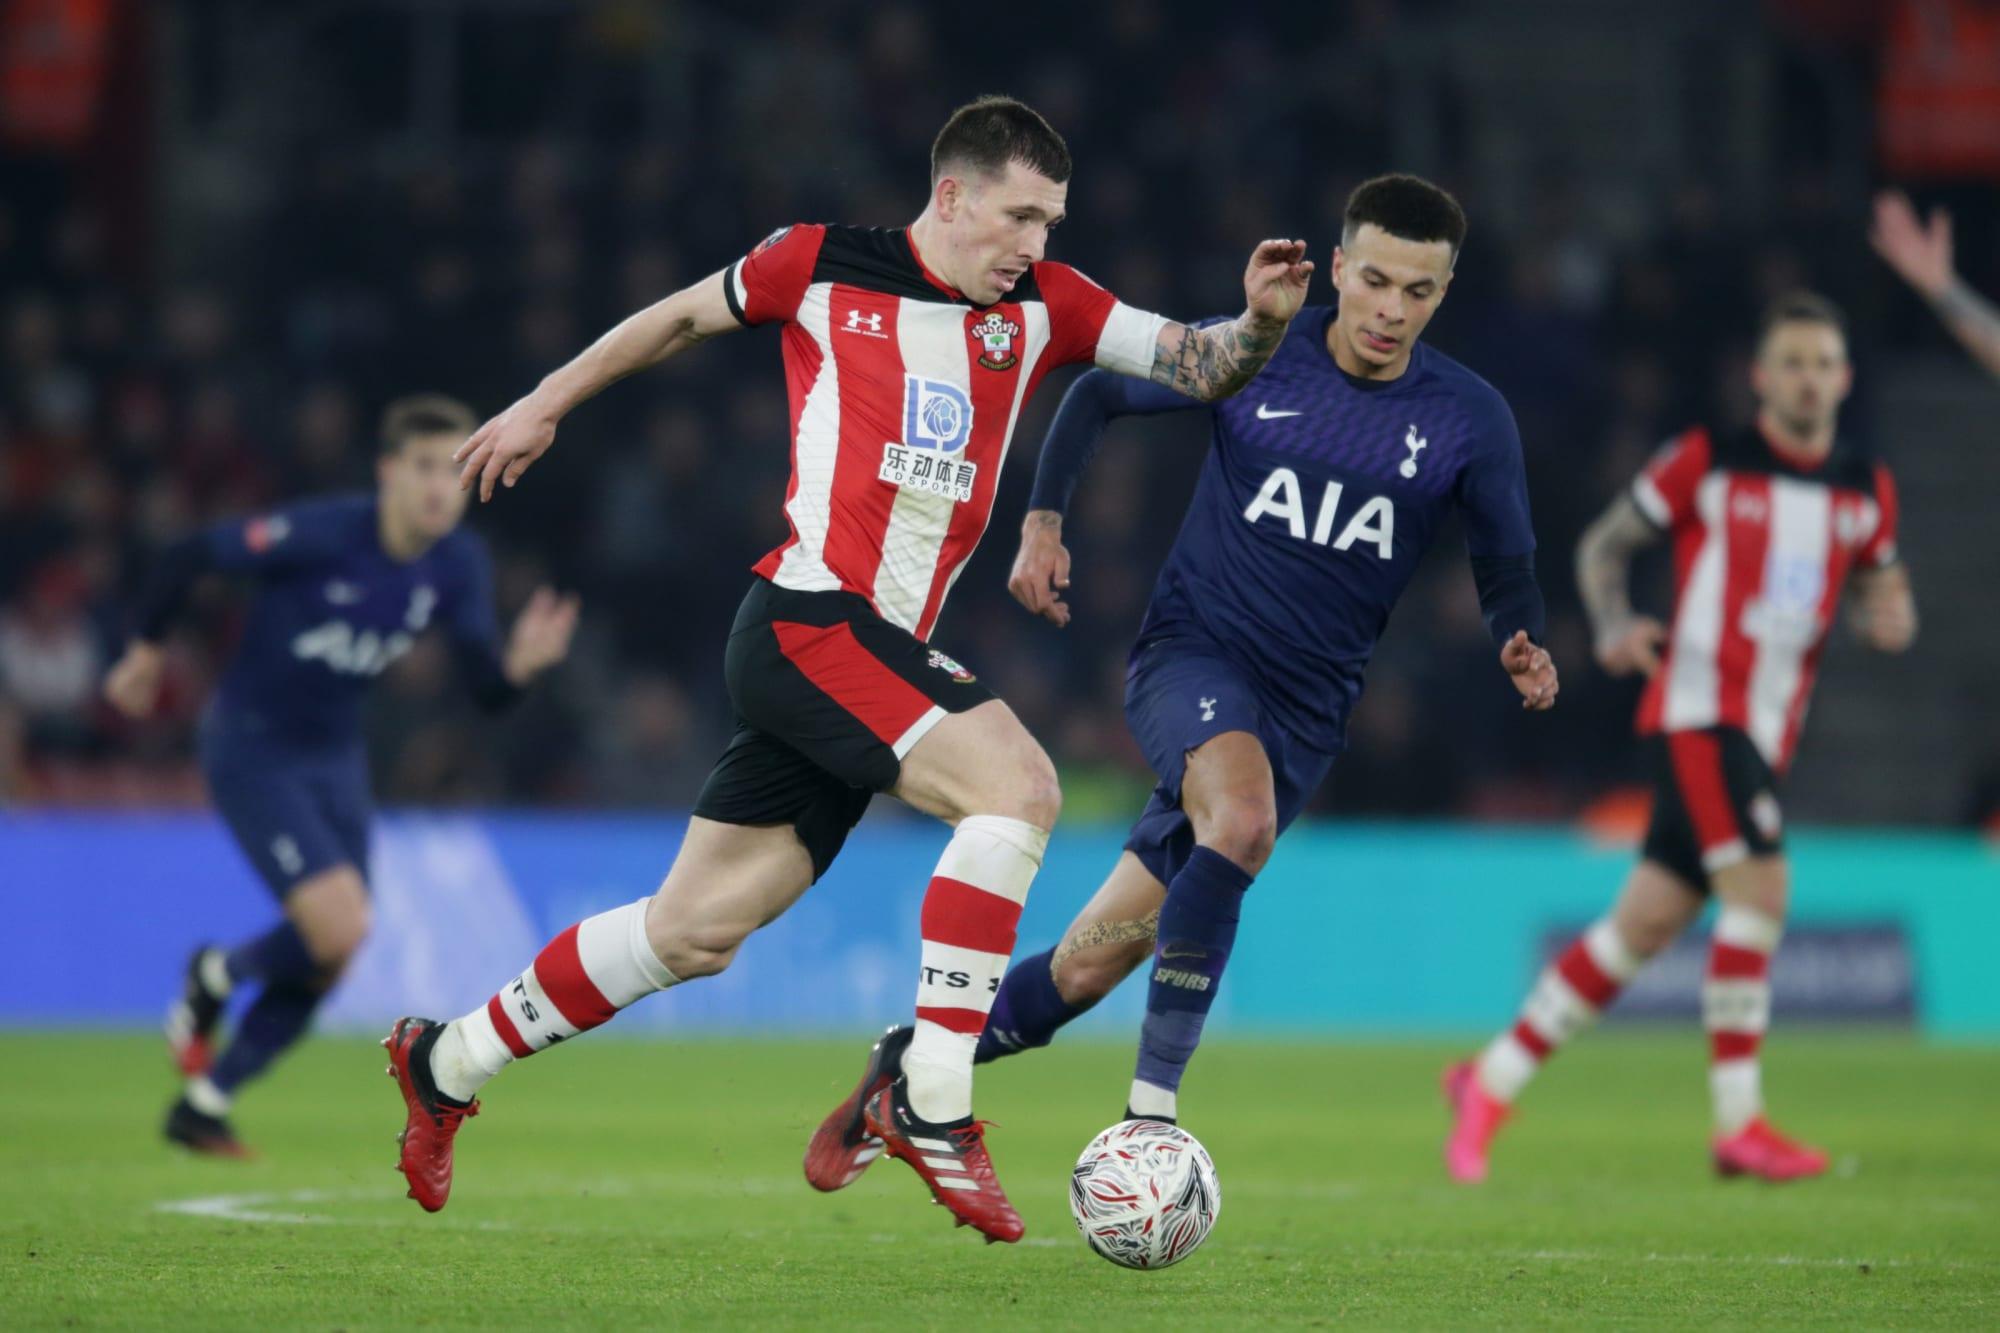 Tottenham: Pierre-Emile Hojbjerg, Kyle Walker-Peters deals now official